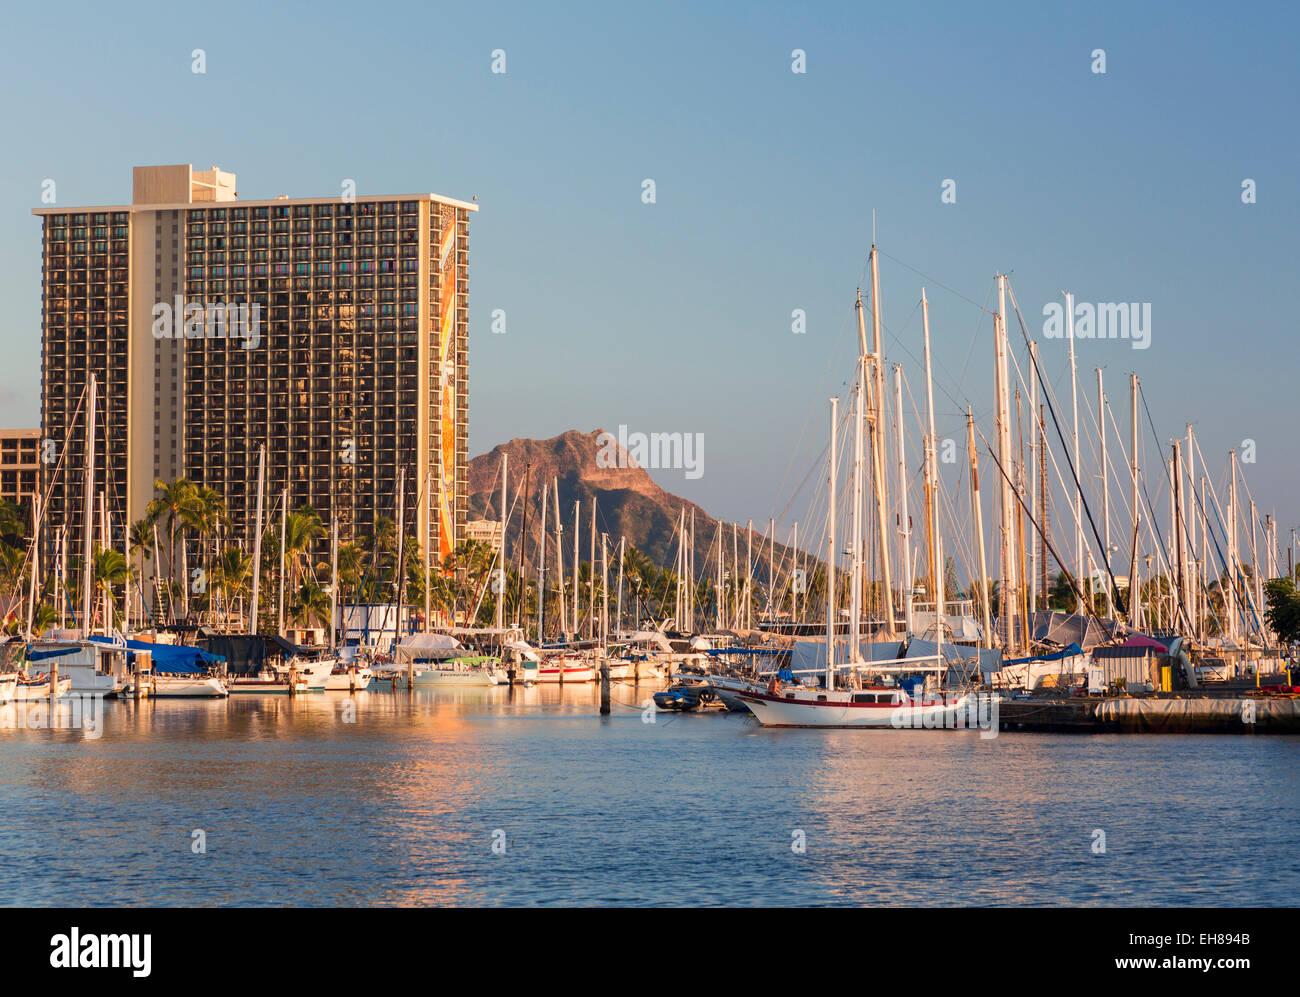 Waikiki Hawaii, con barche a vela in Ala Moana Harbour e l'Hilton Hawaiian Village resort dietro Immagini Stock